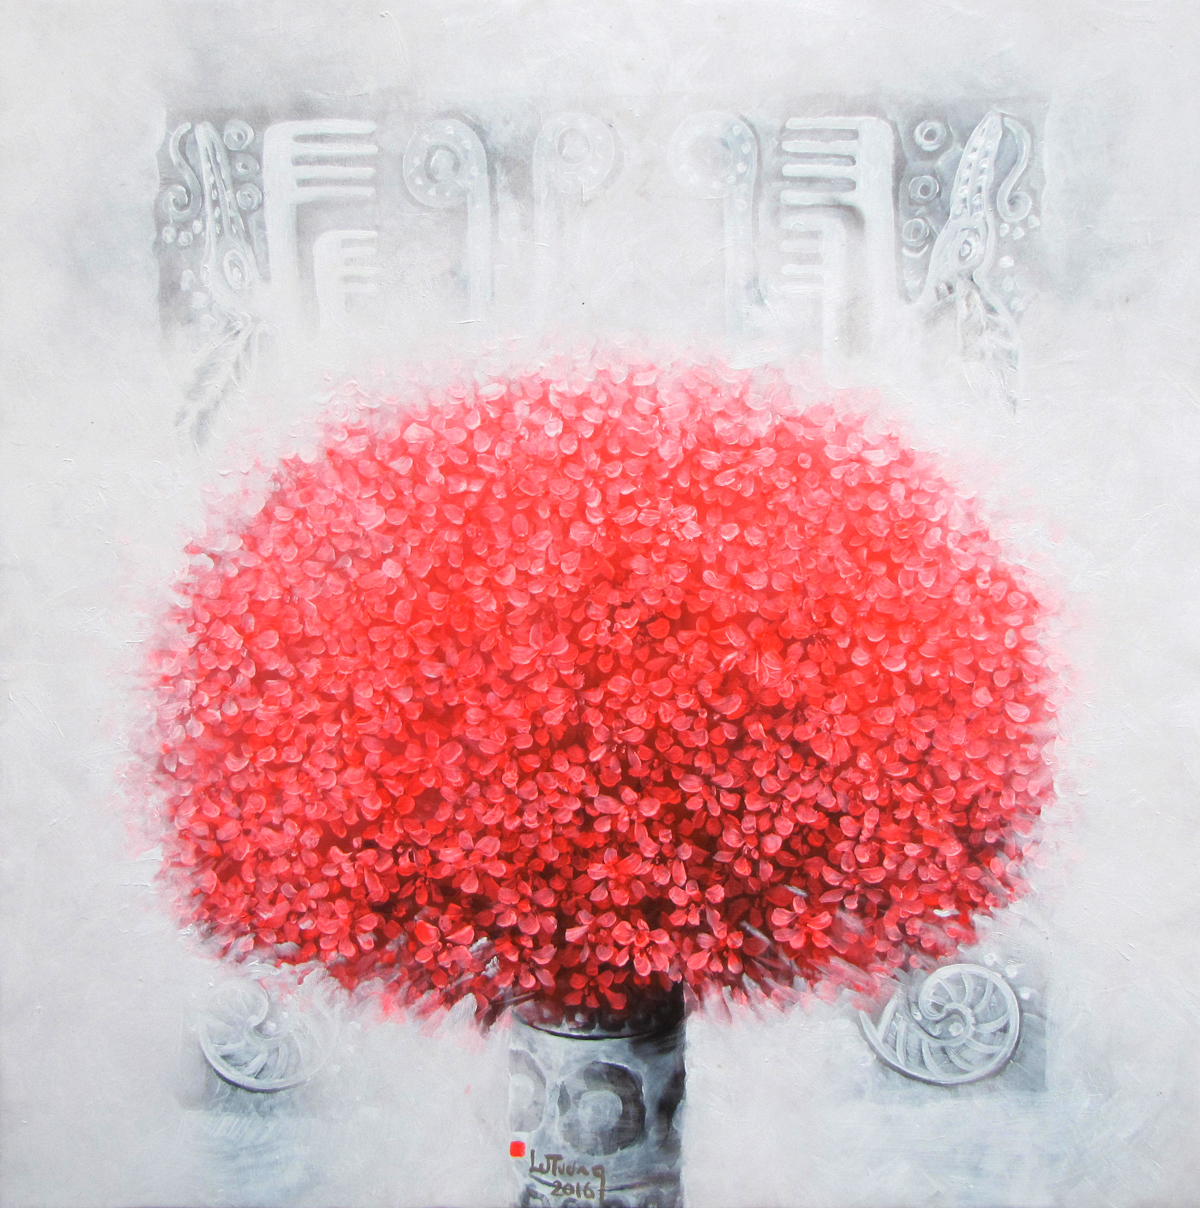 Vase of Red Flower - Original Vietnamese Art